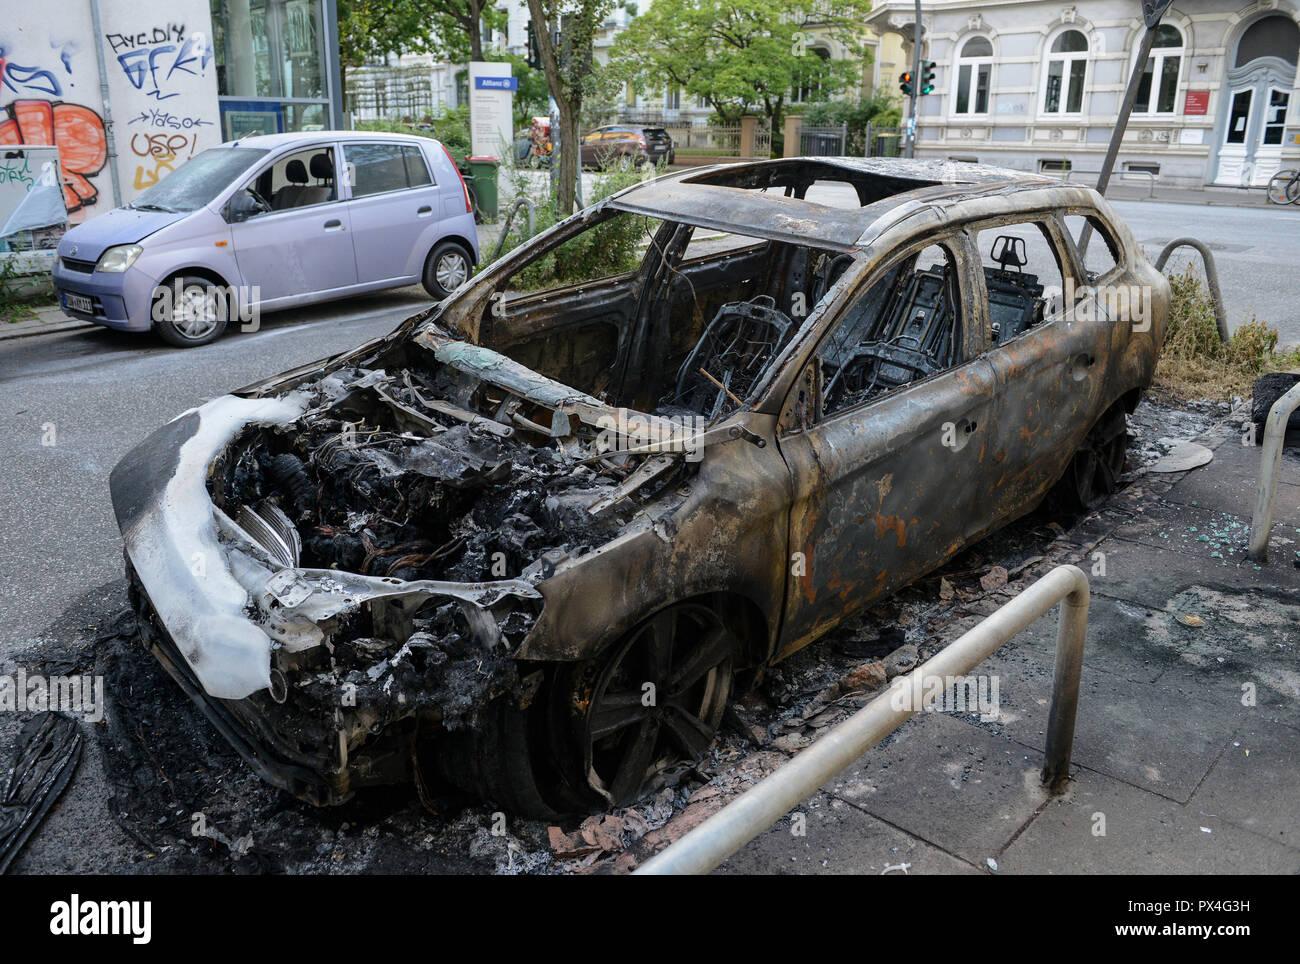 GERMANY, Hamburg, G-20 summit, riots, radicals have burned cars on the streets  / DEUTSCHLAND, Hamburg, G20 Gipfel in Hamburg, Randale, abgebrannte Autos - Stock Image